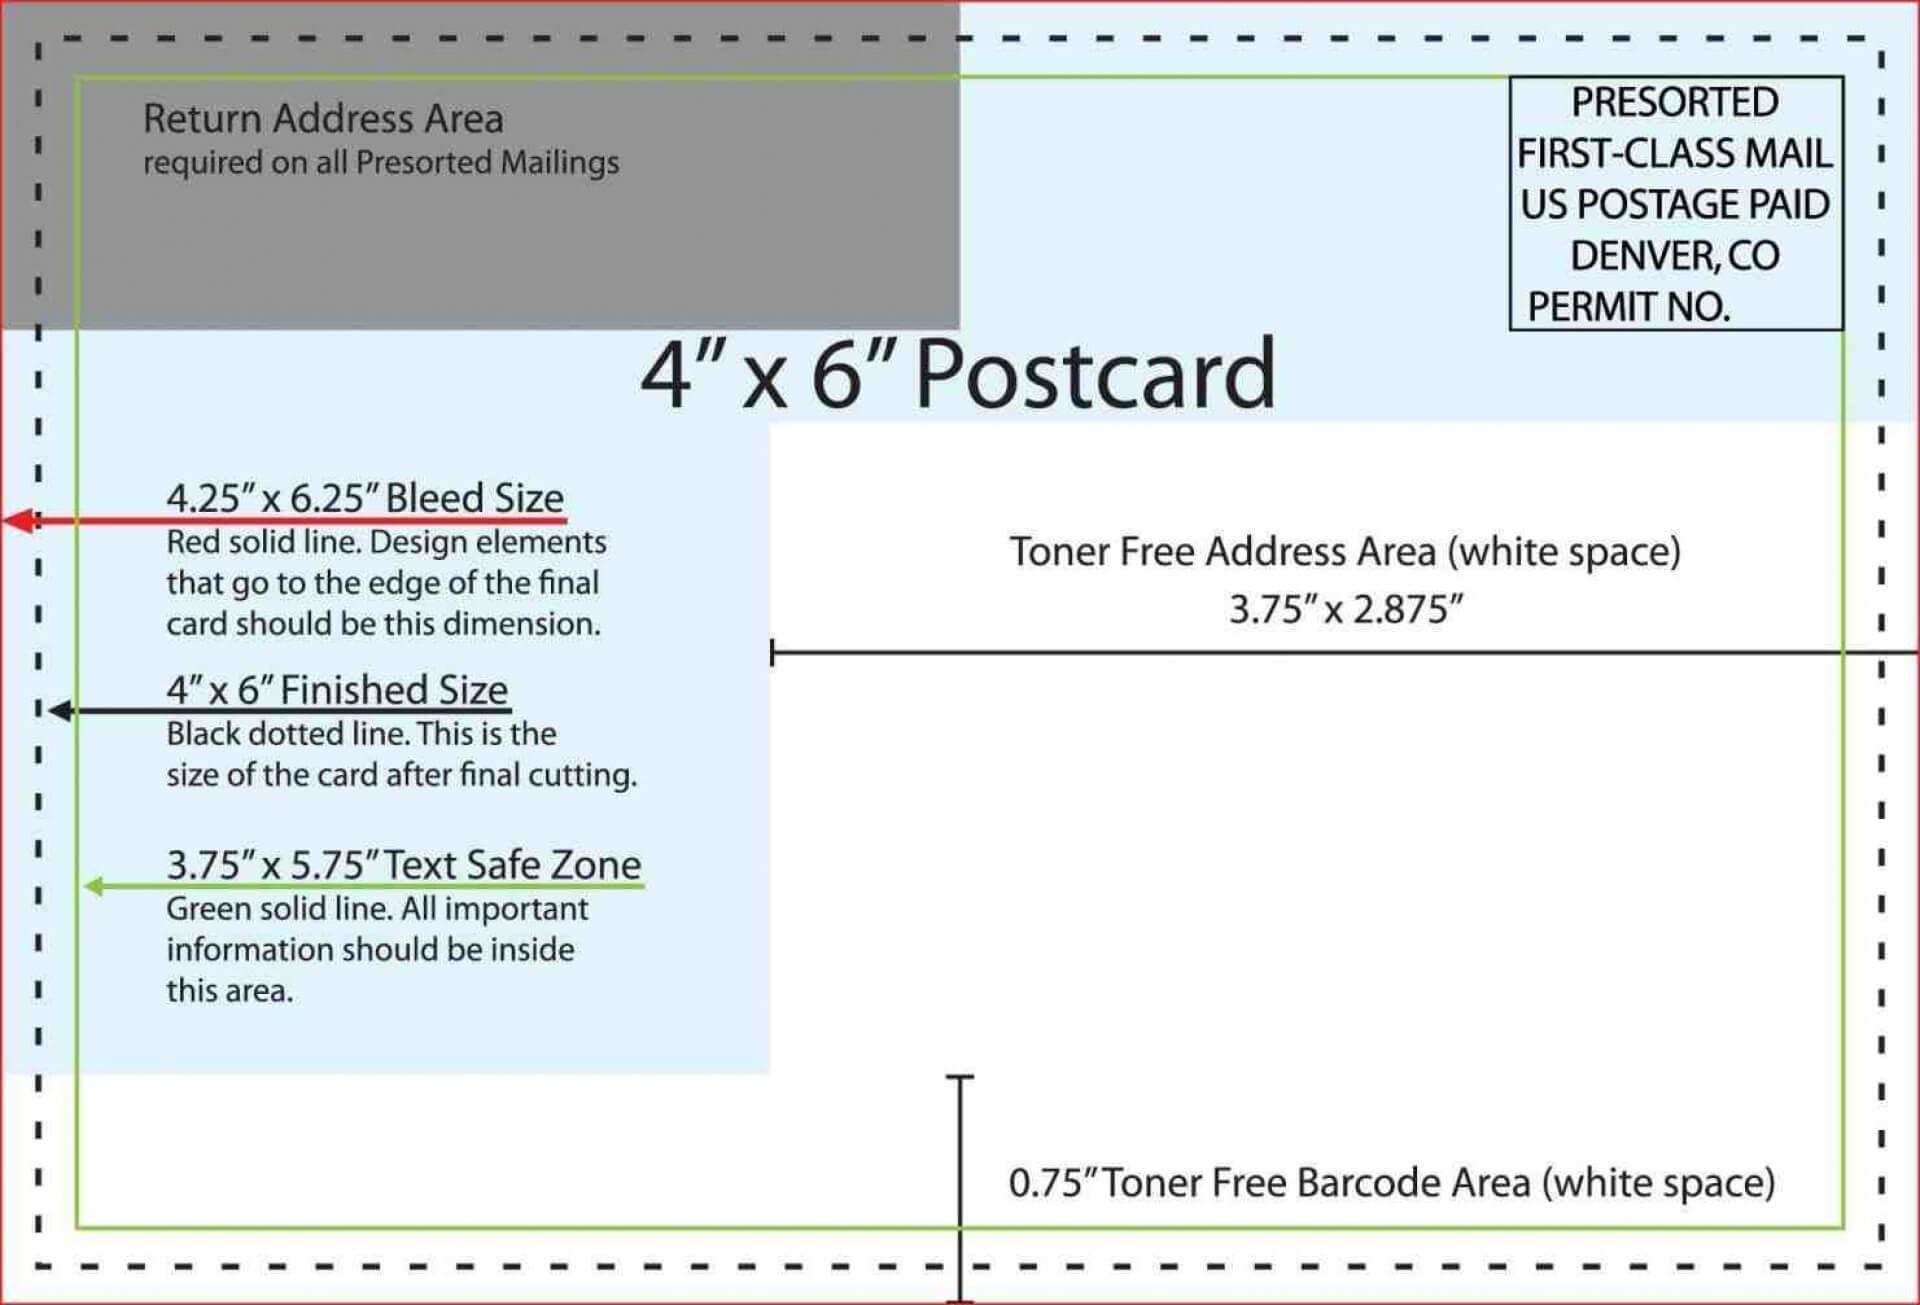 001 Template Ideas X Templates 4X6 Card Resume Postcard Pertaining To Microsoft Word 4X6 Postcard Template